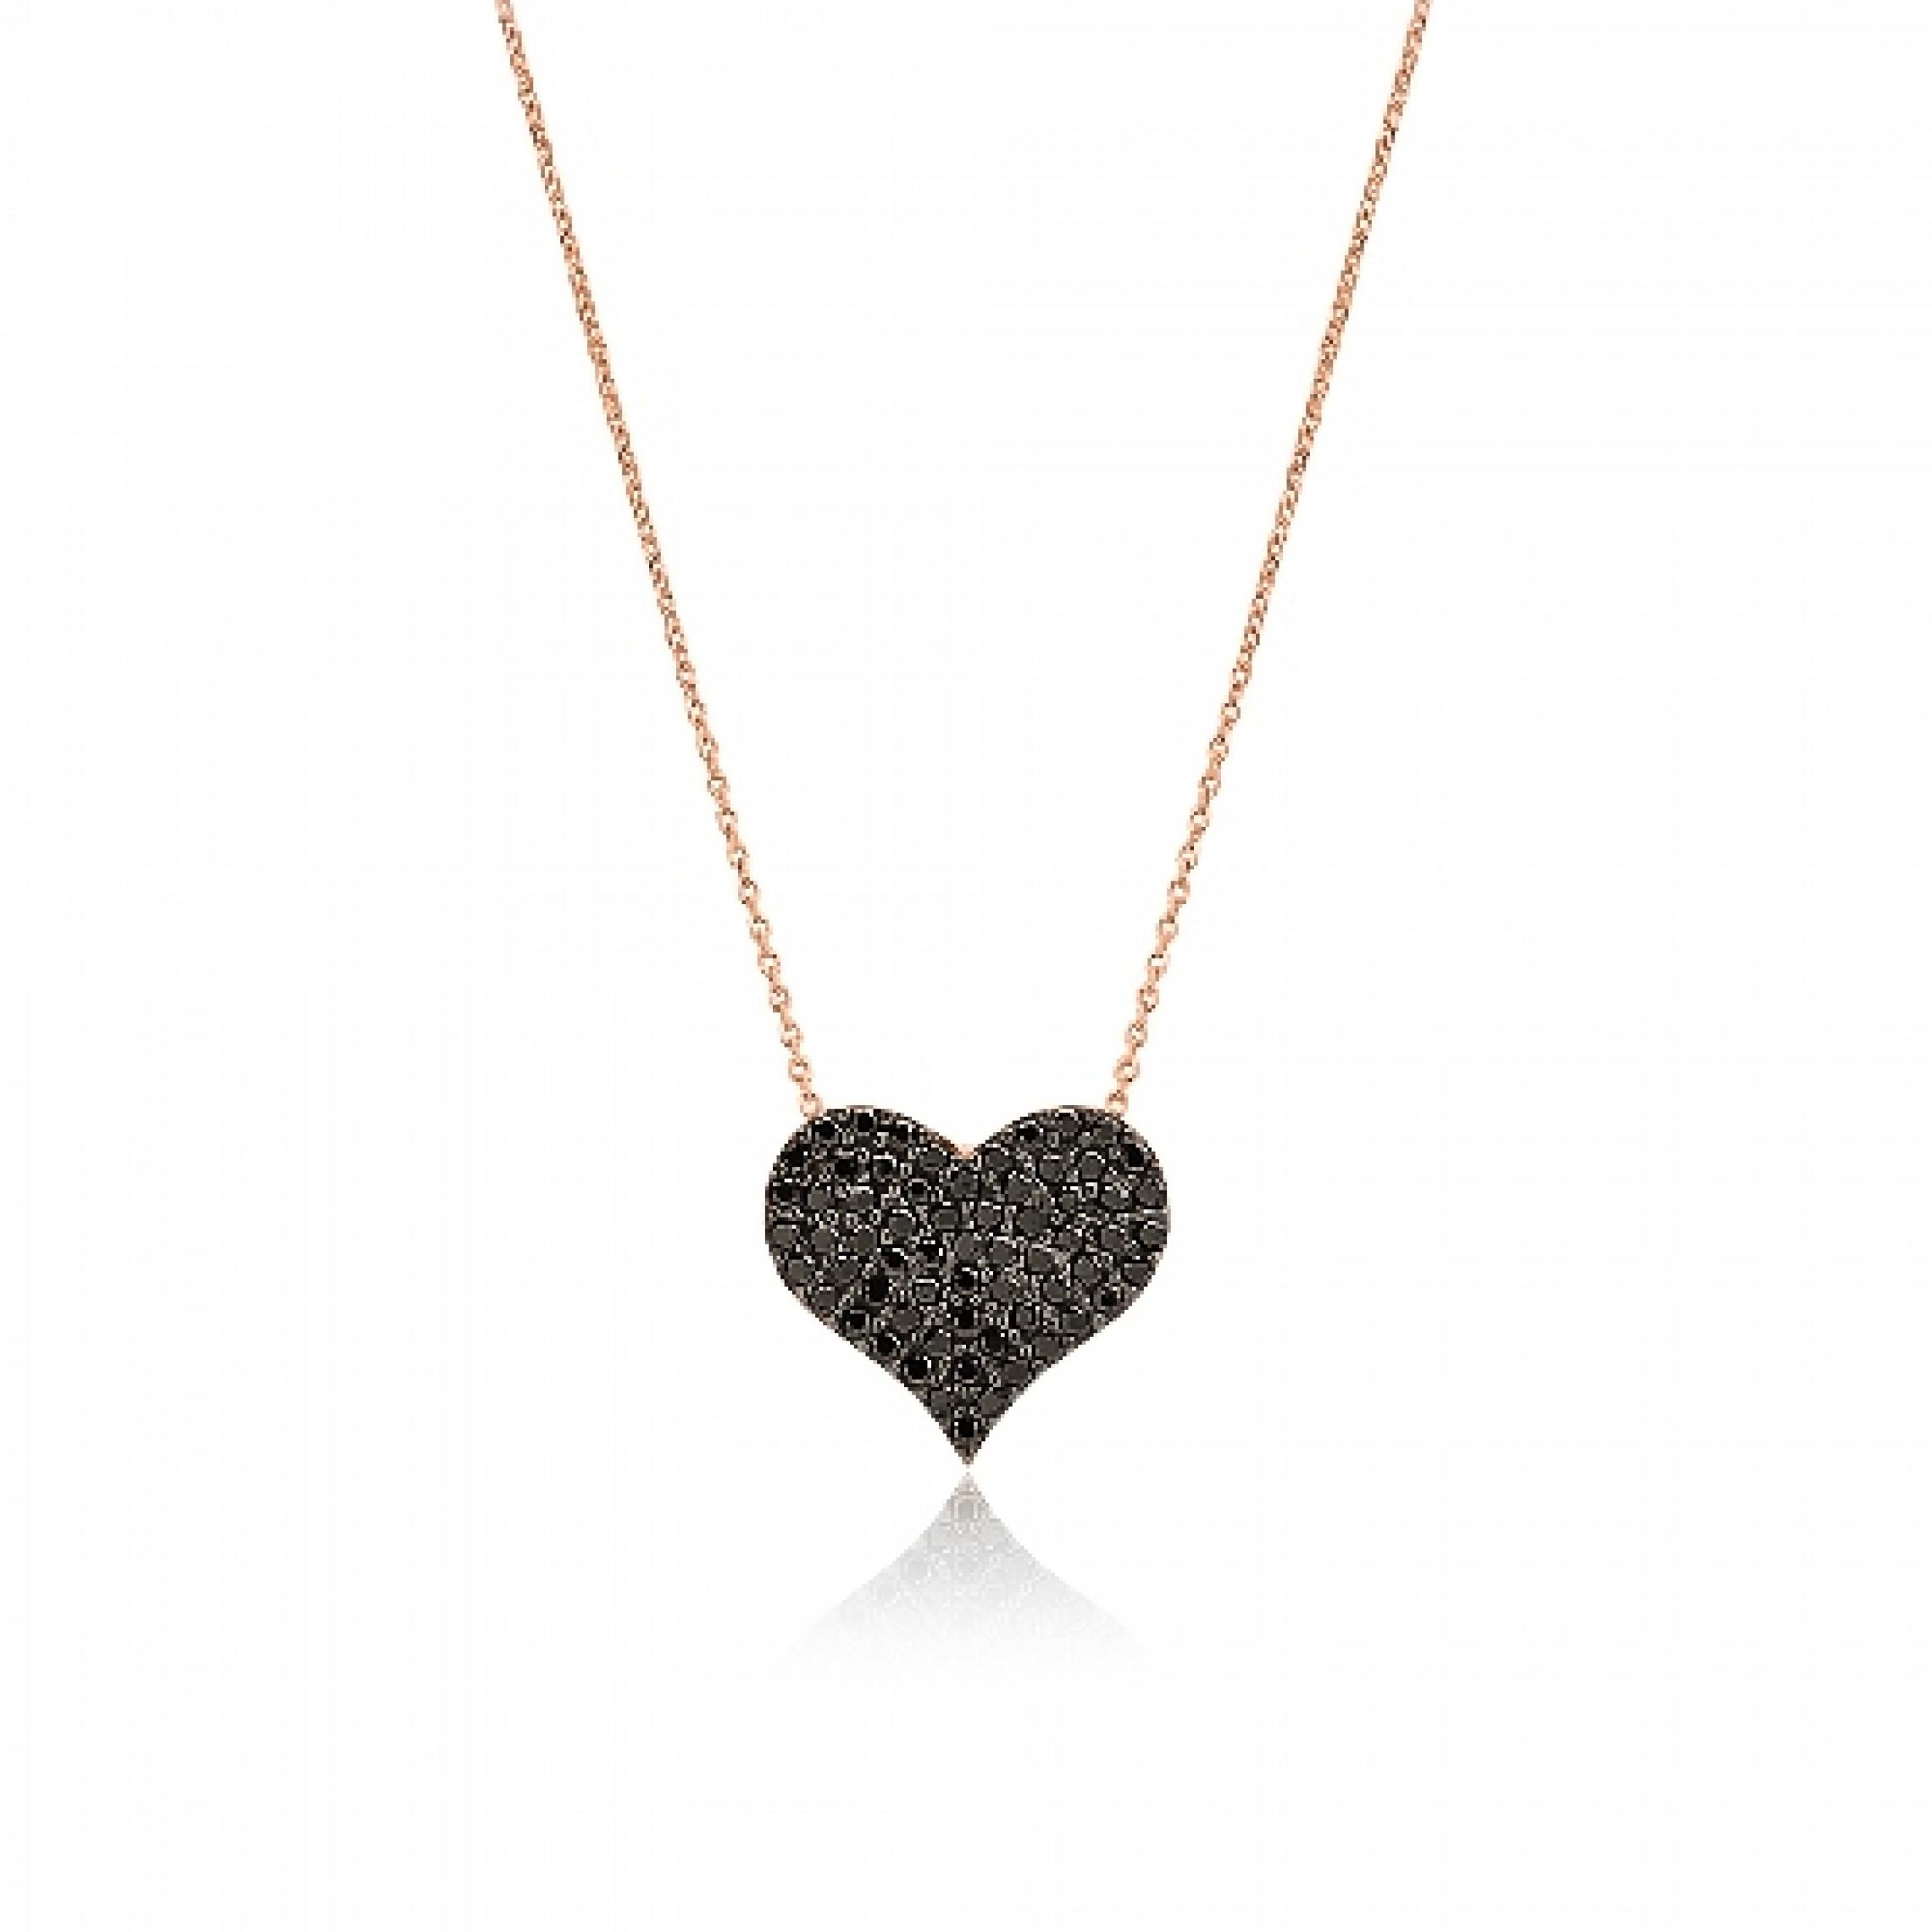 JN-190082 Evil Eye 925 Sterling Silver CZ Necklace Heart